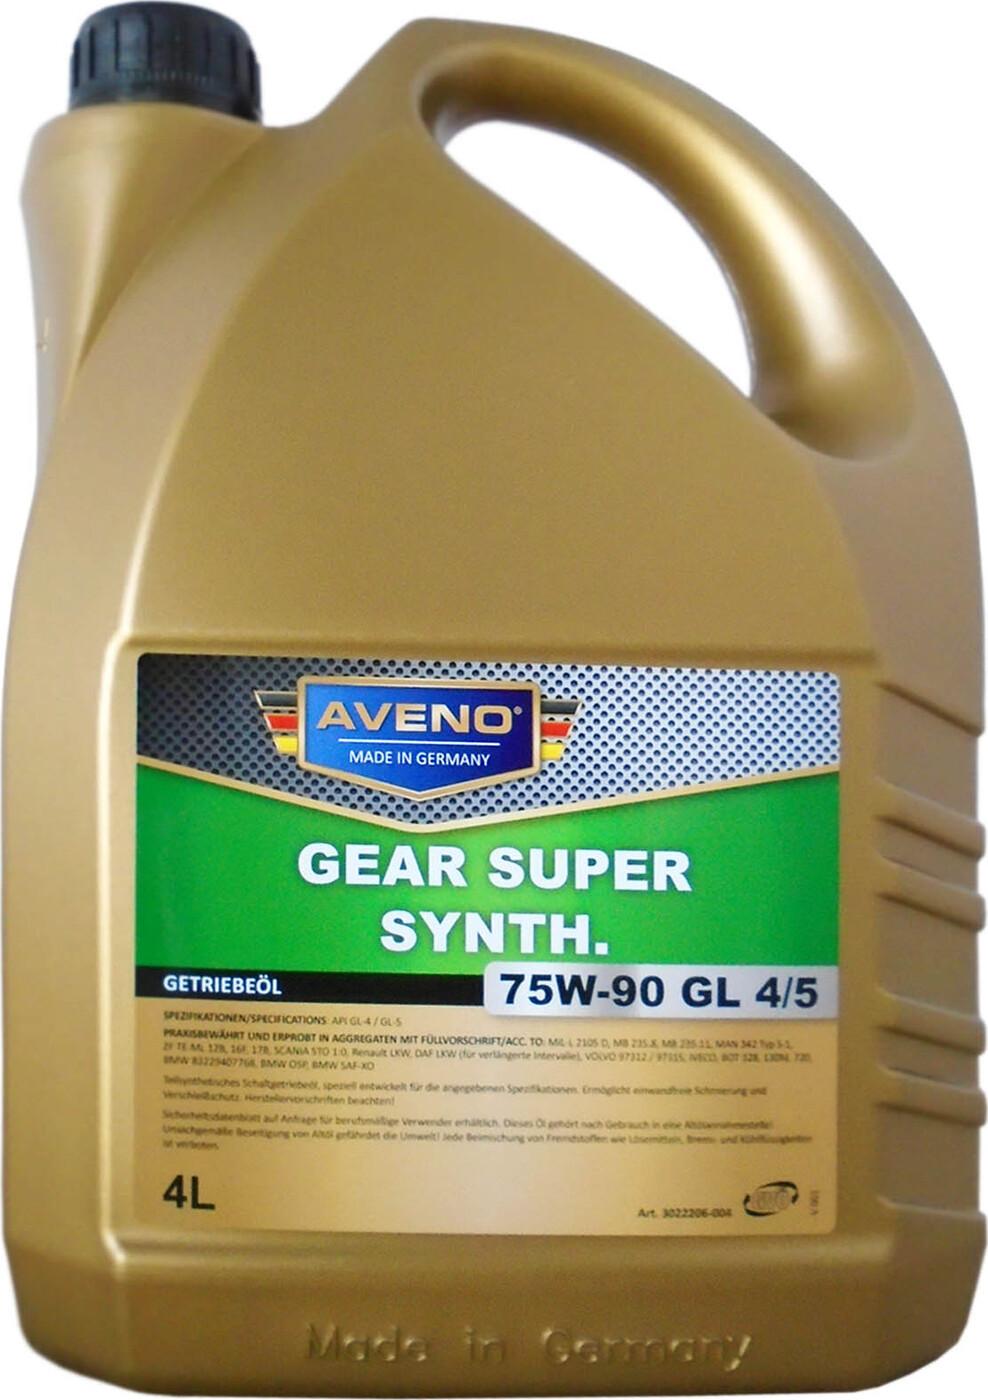 Трансмиссионное масло AVENO Gear Super Synth, SAE 75W-90 GL 4/5 (4л) фото